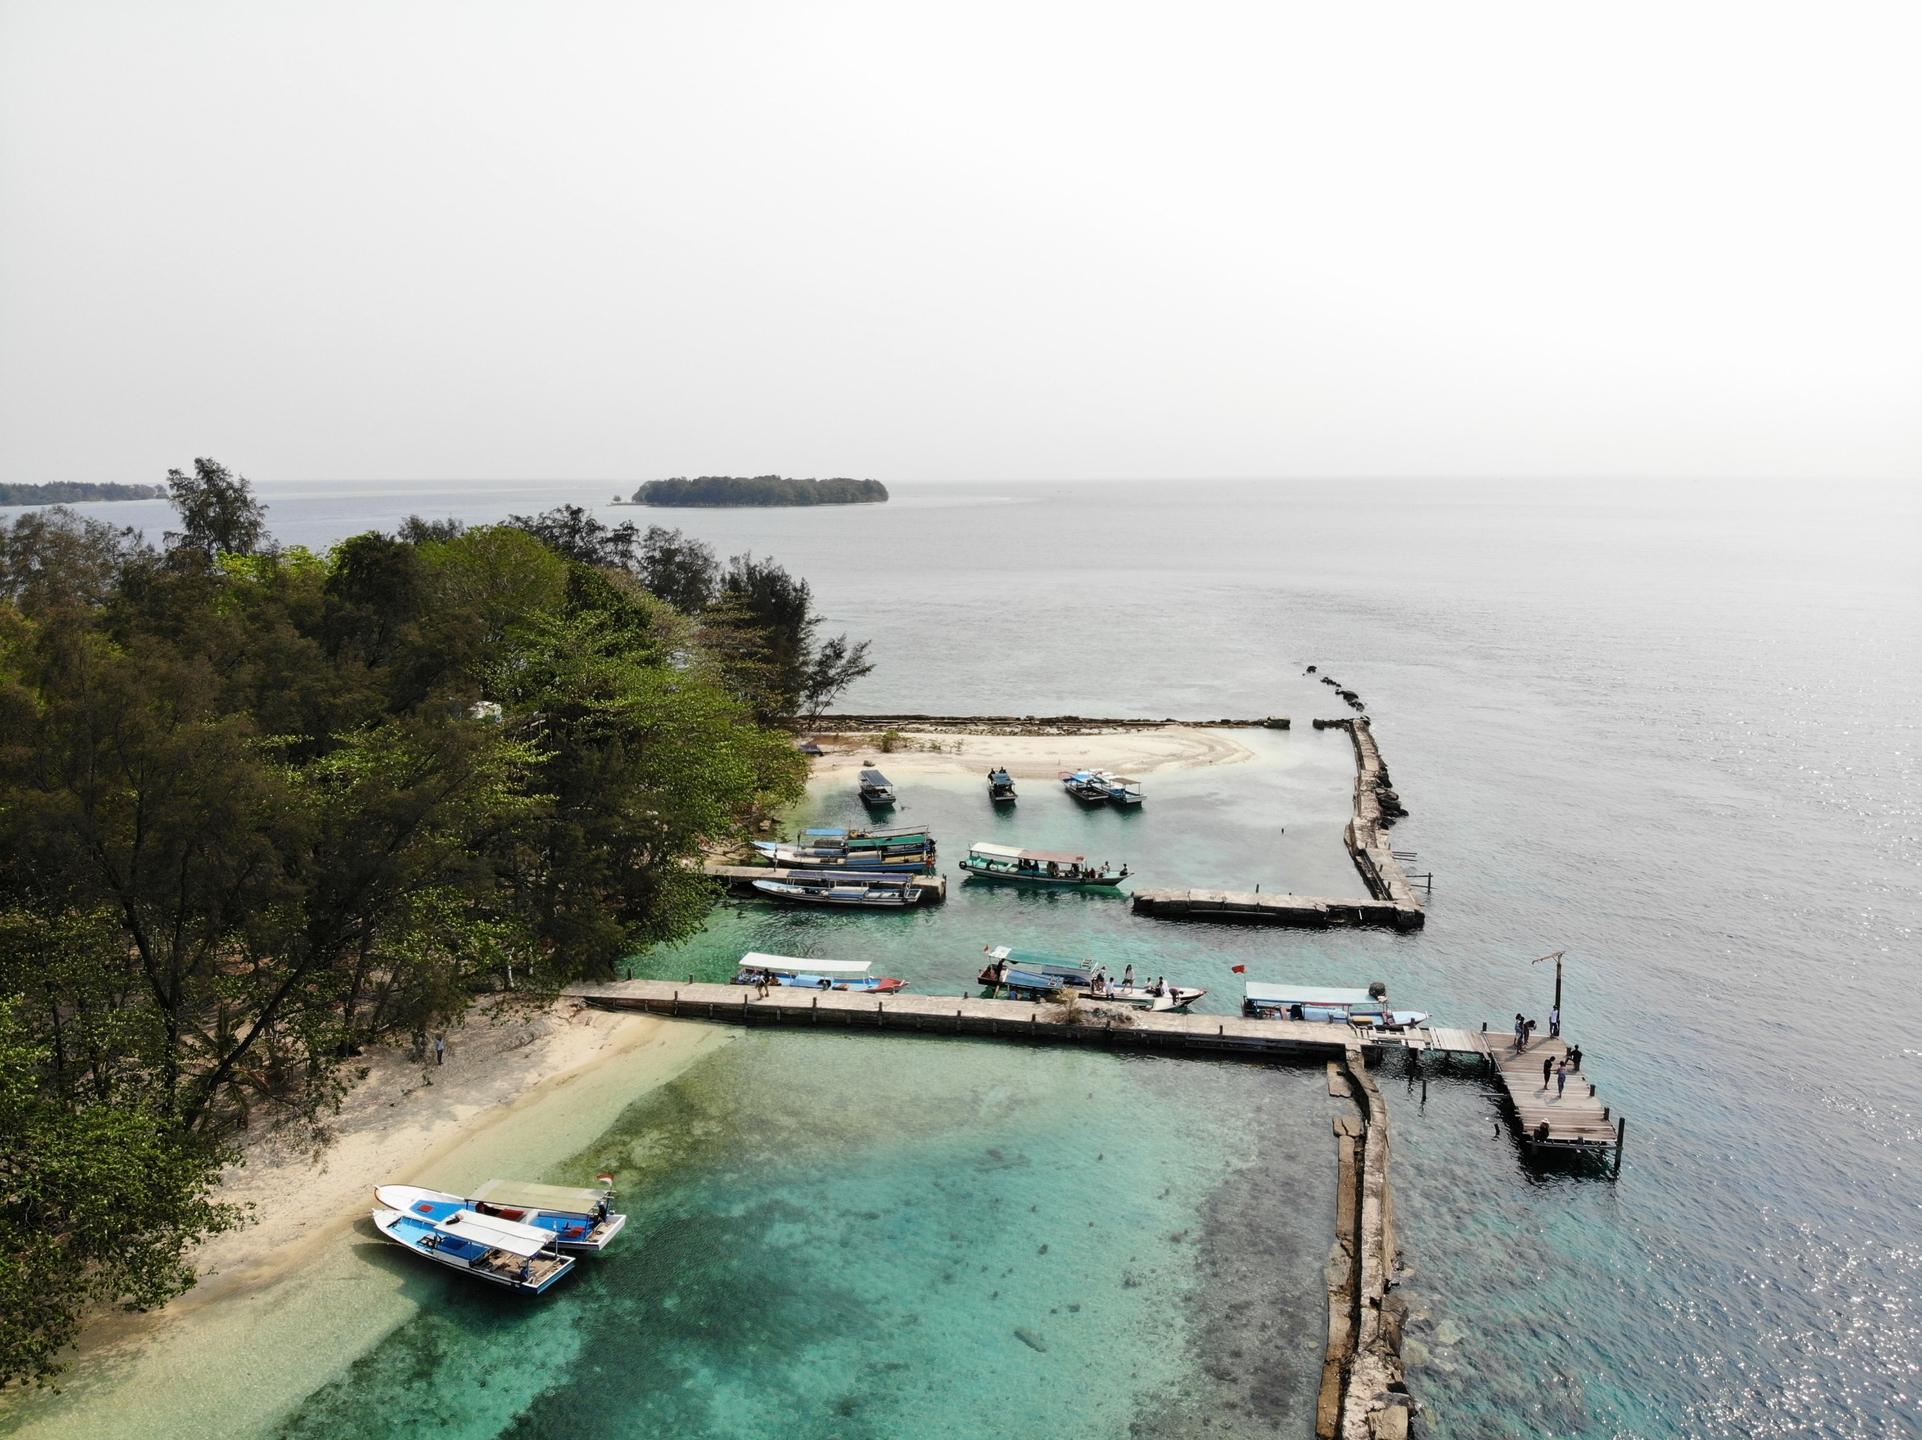 bibit ikan nila lele di manado (@bibitikannilaleledimanado) Cover Image